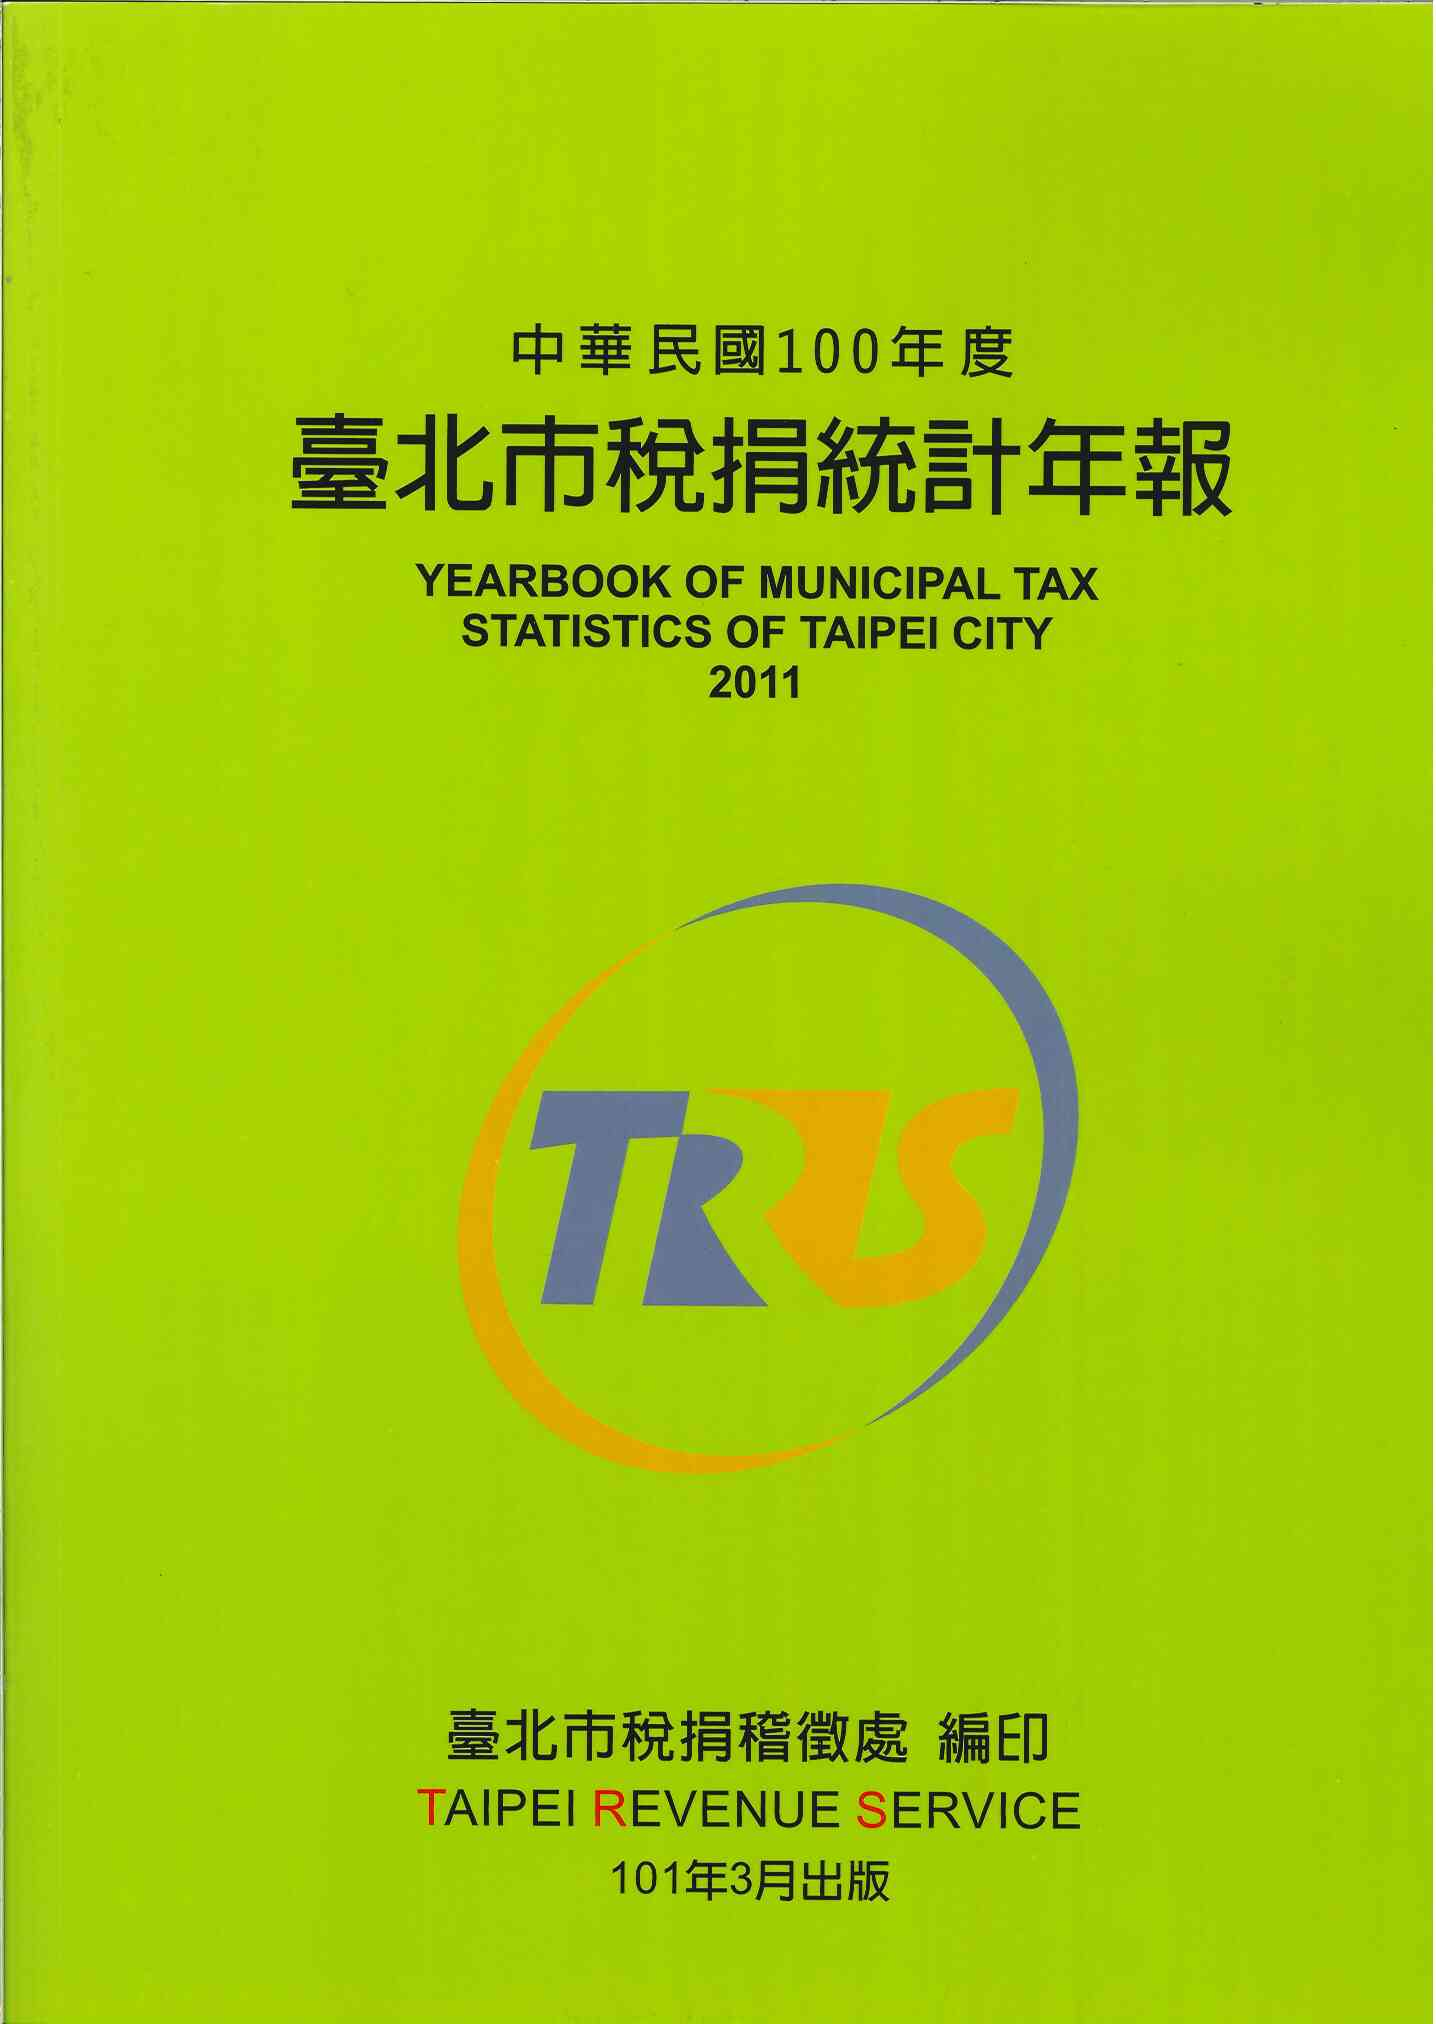 臺北市稅捐統計年報=Yearbook of municipal tax statistics of Taipei city